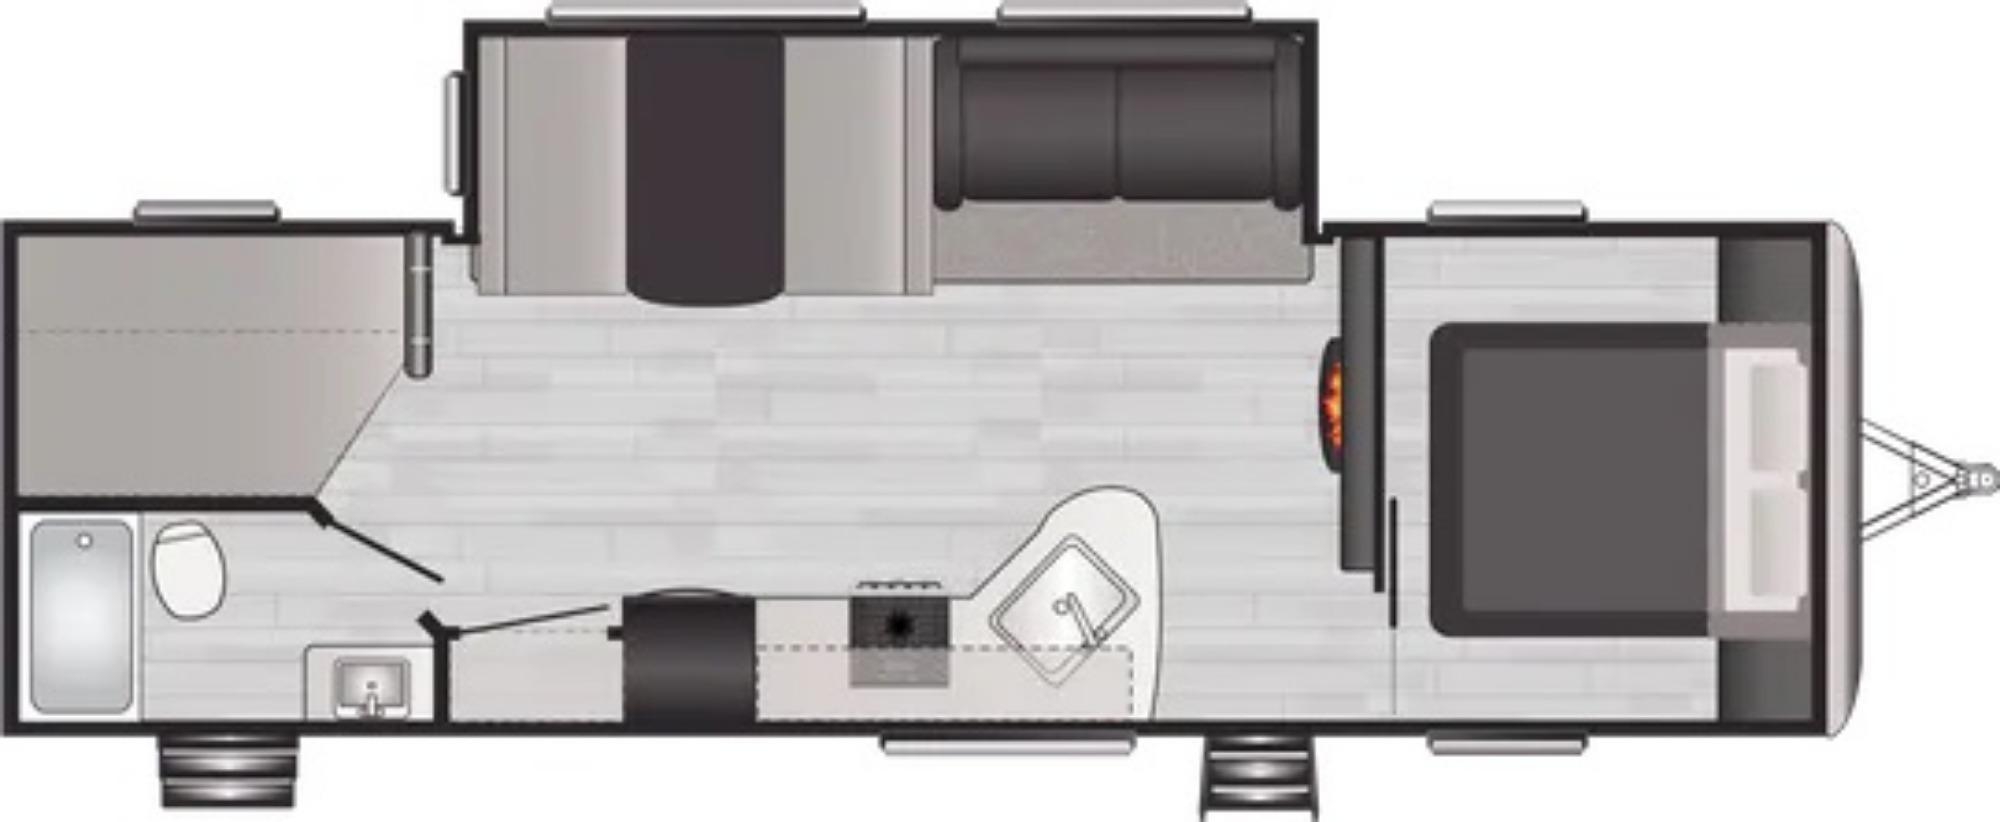 View Floor Plan for 2022 KEYSTONE SPRINGDALE 282BH